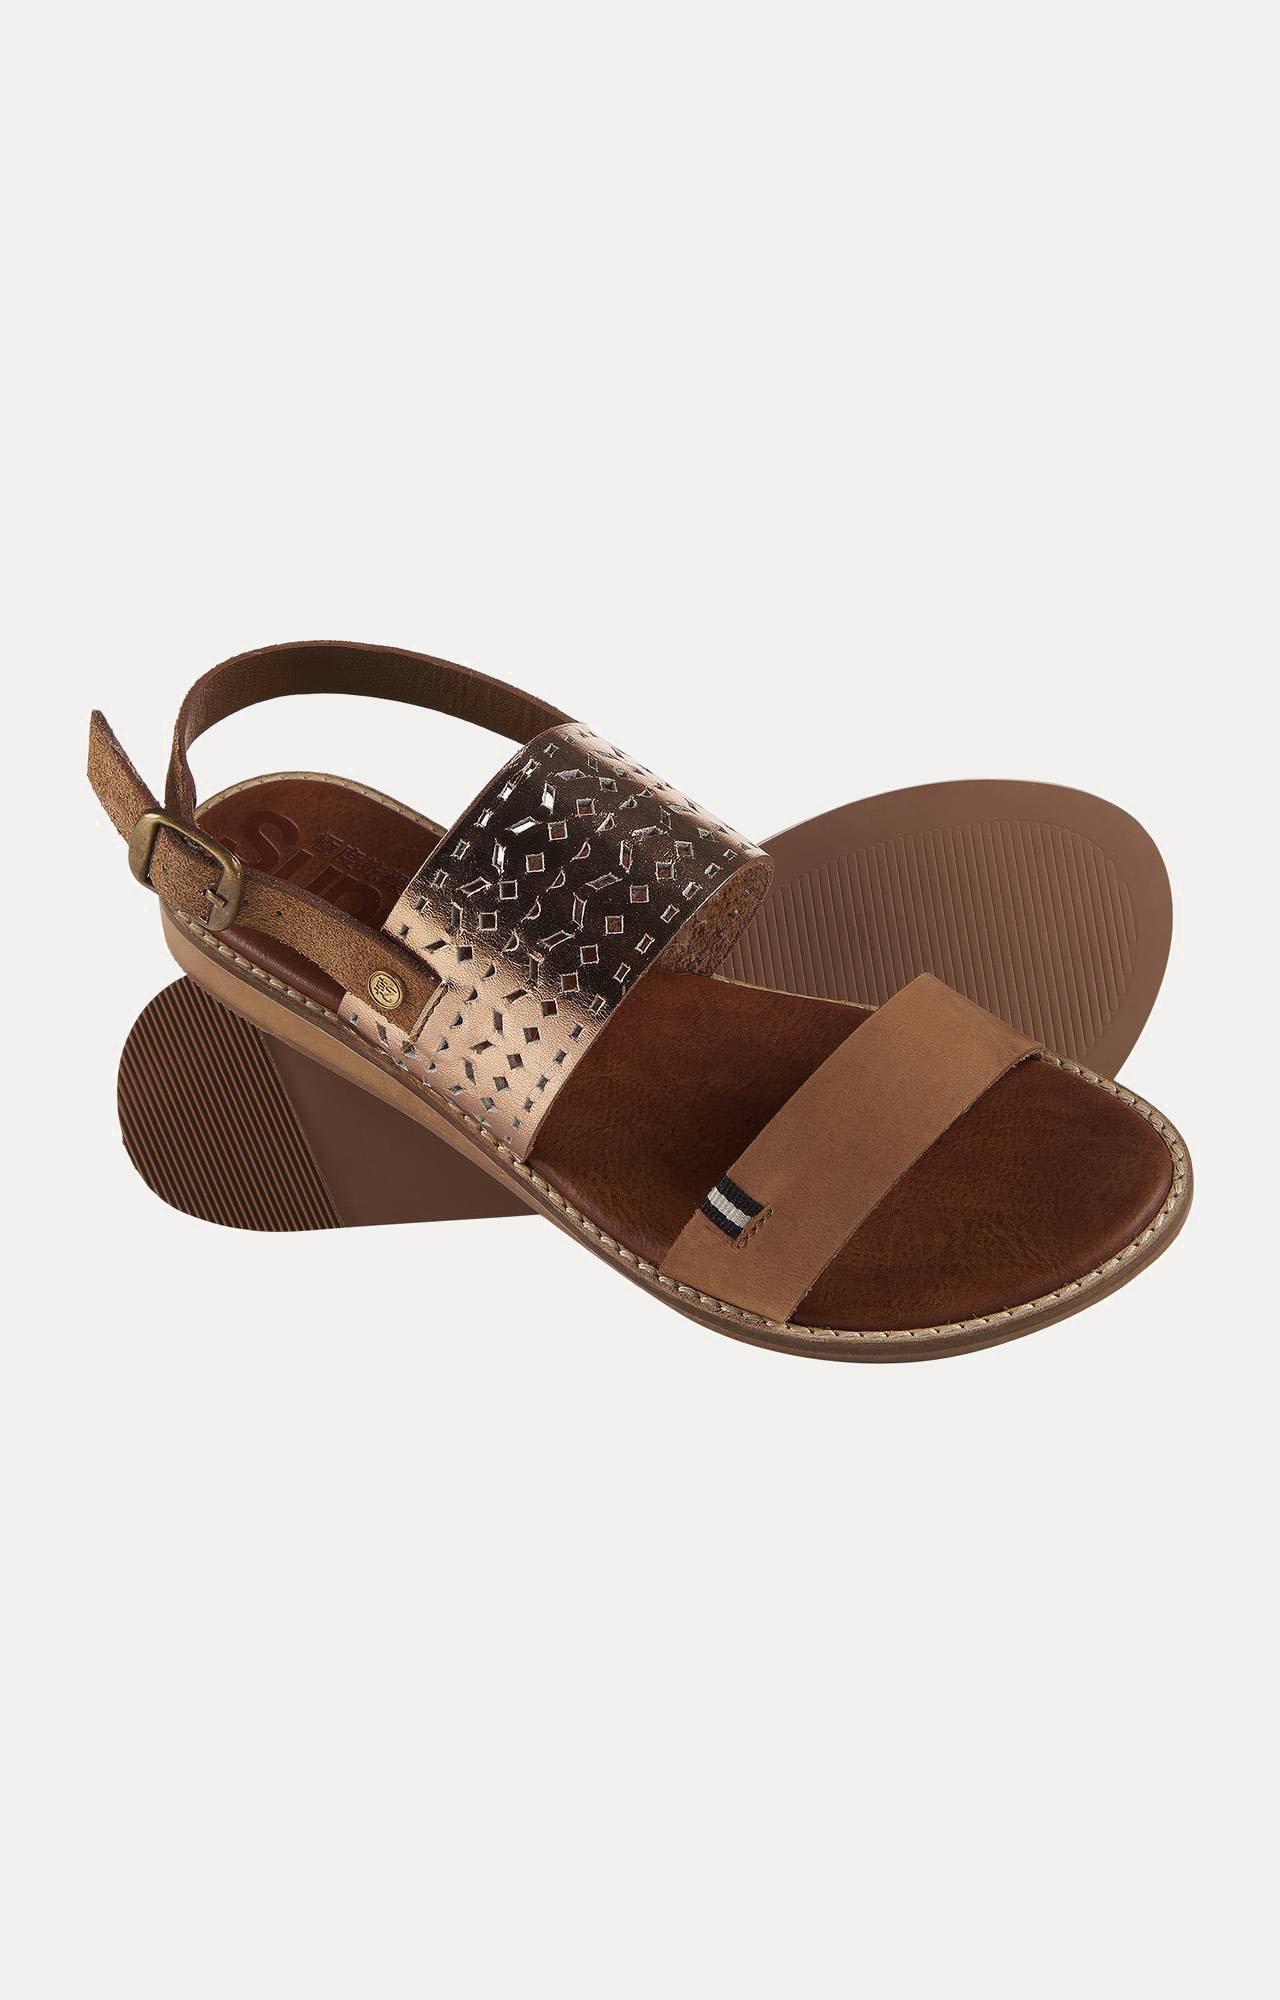 Superdry | Sandbar Double Strap Tan Sandals